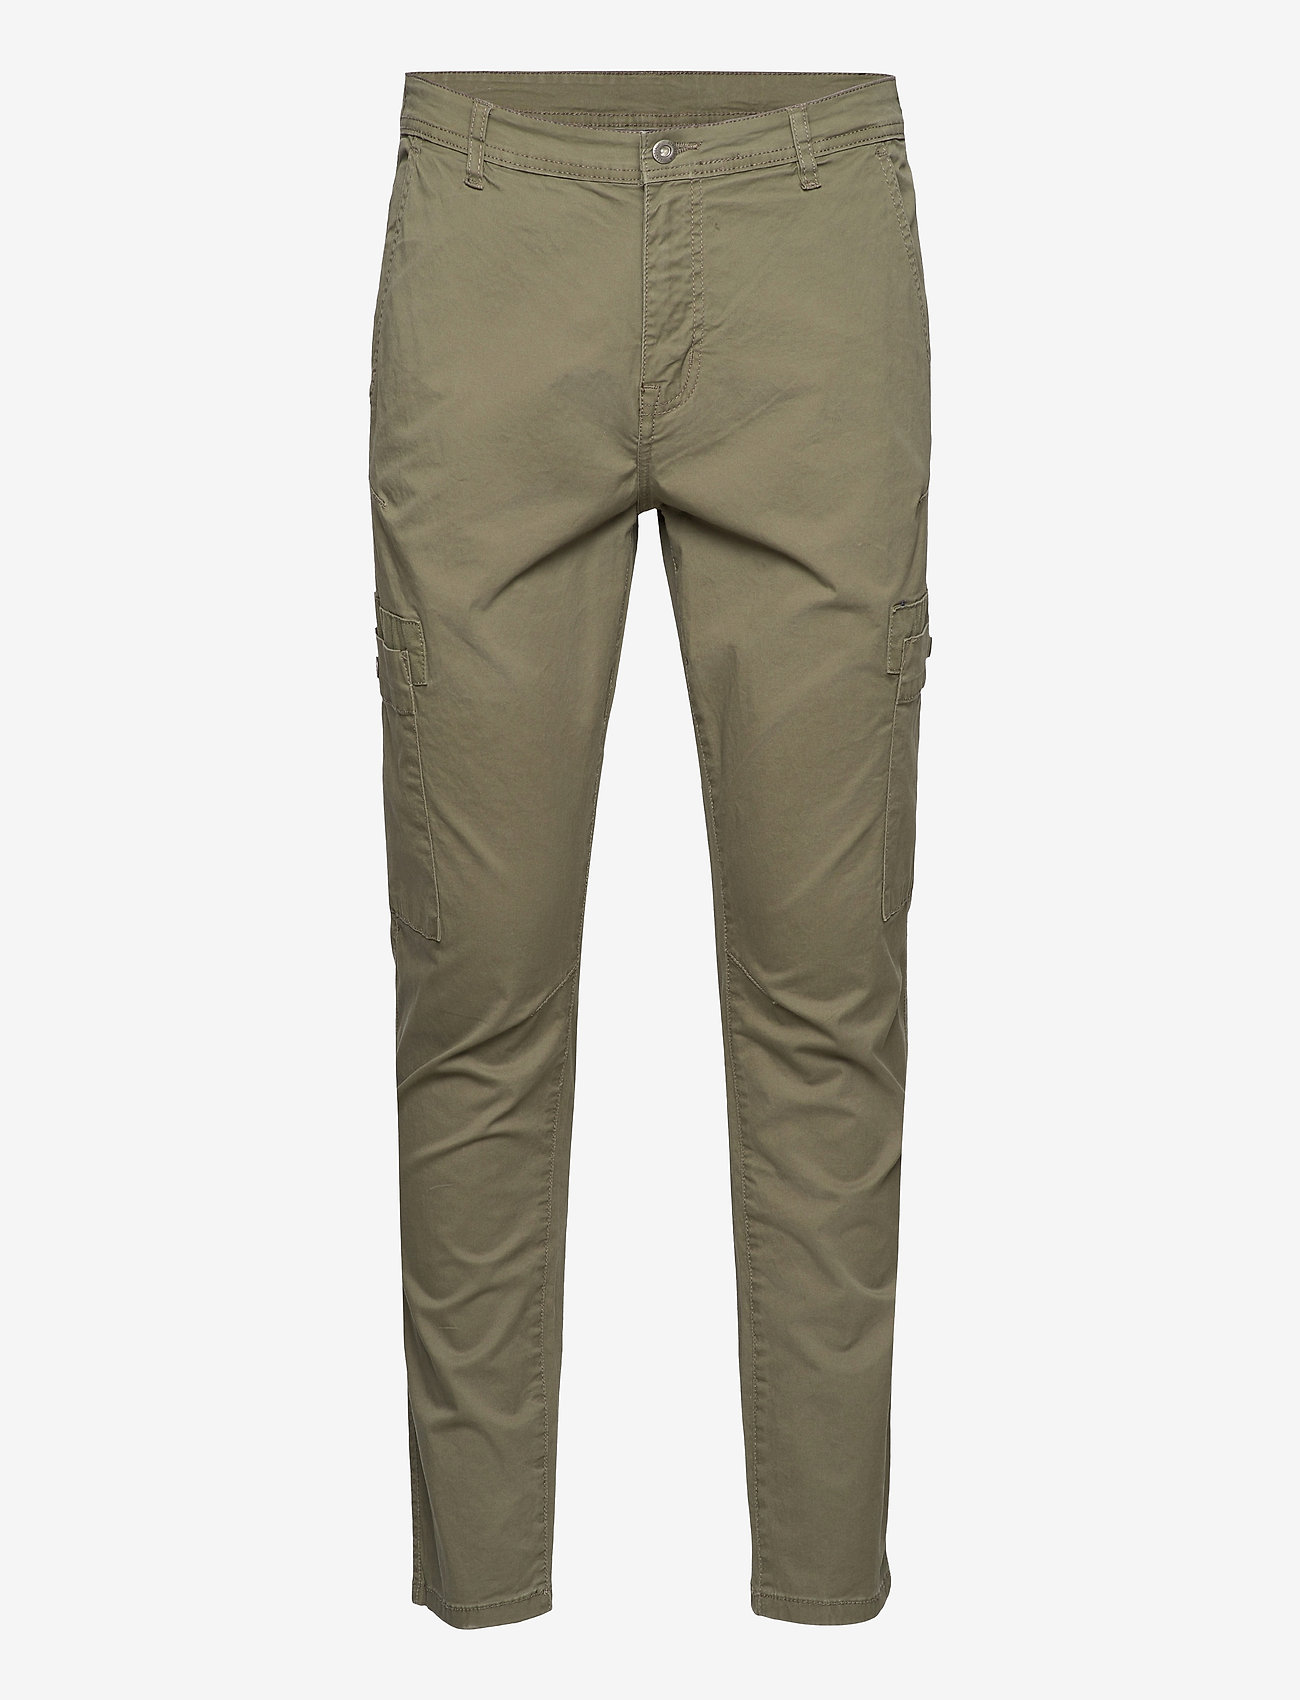 Lindbergh - Cargo pants - cargobukser - army - 1